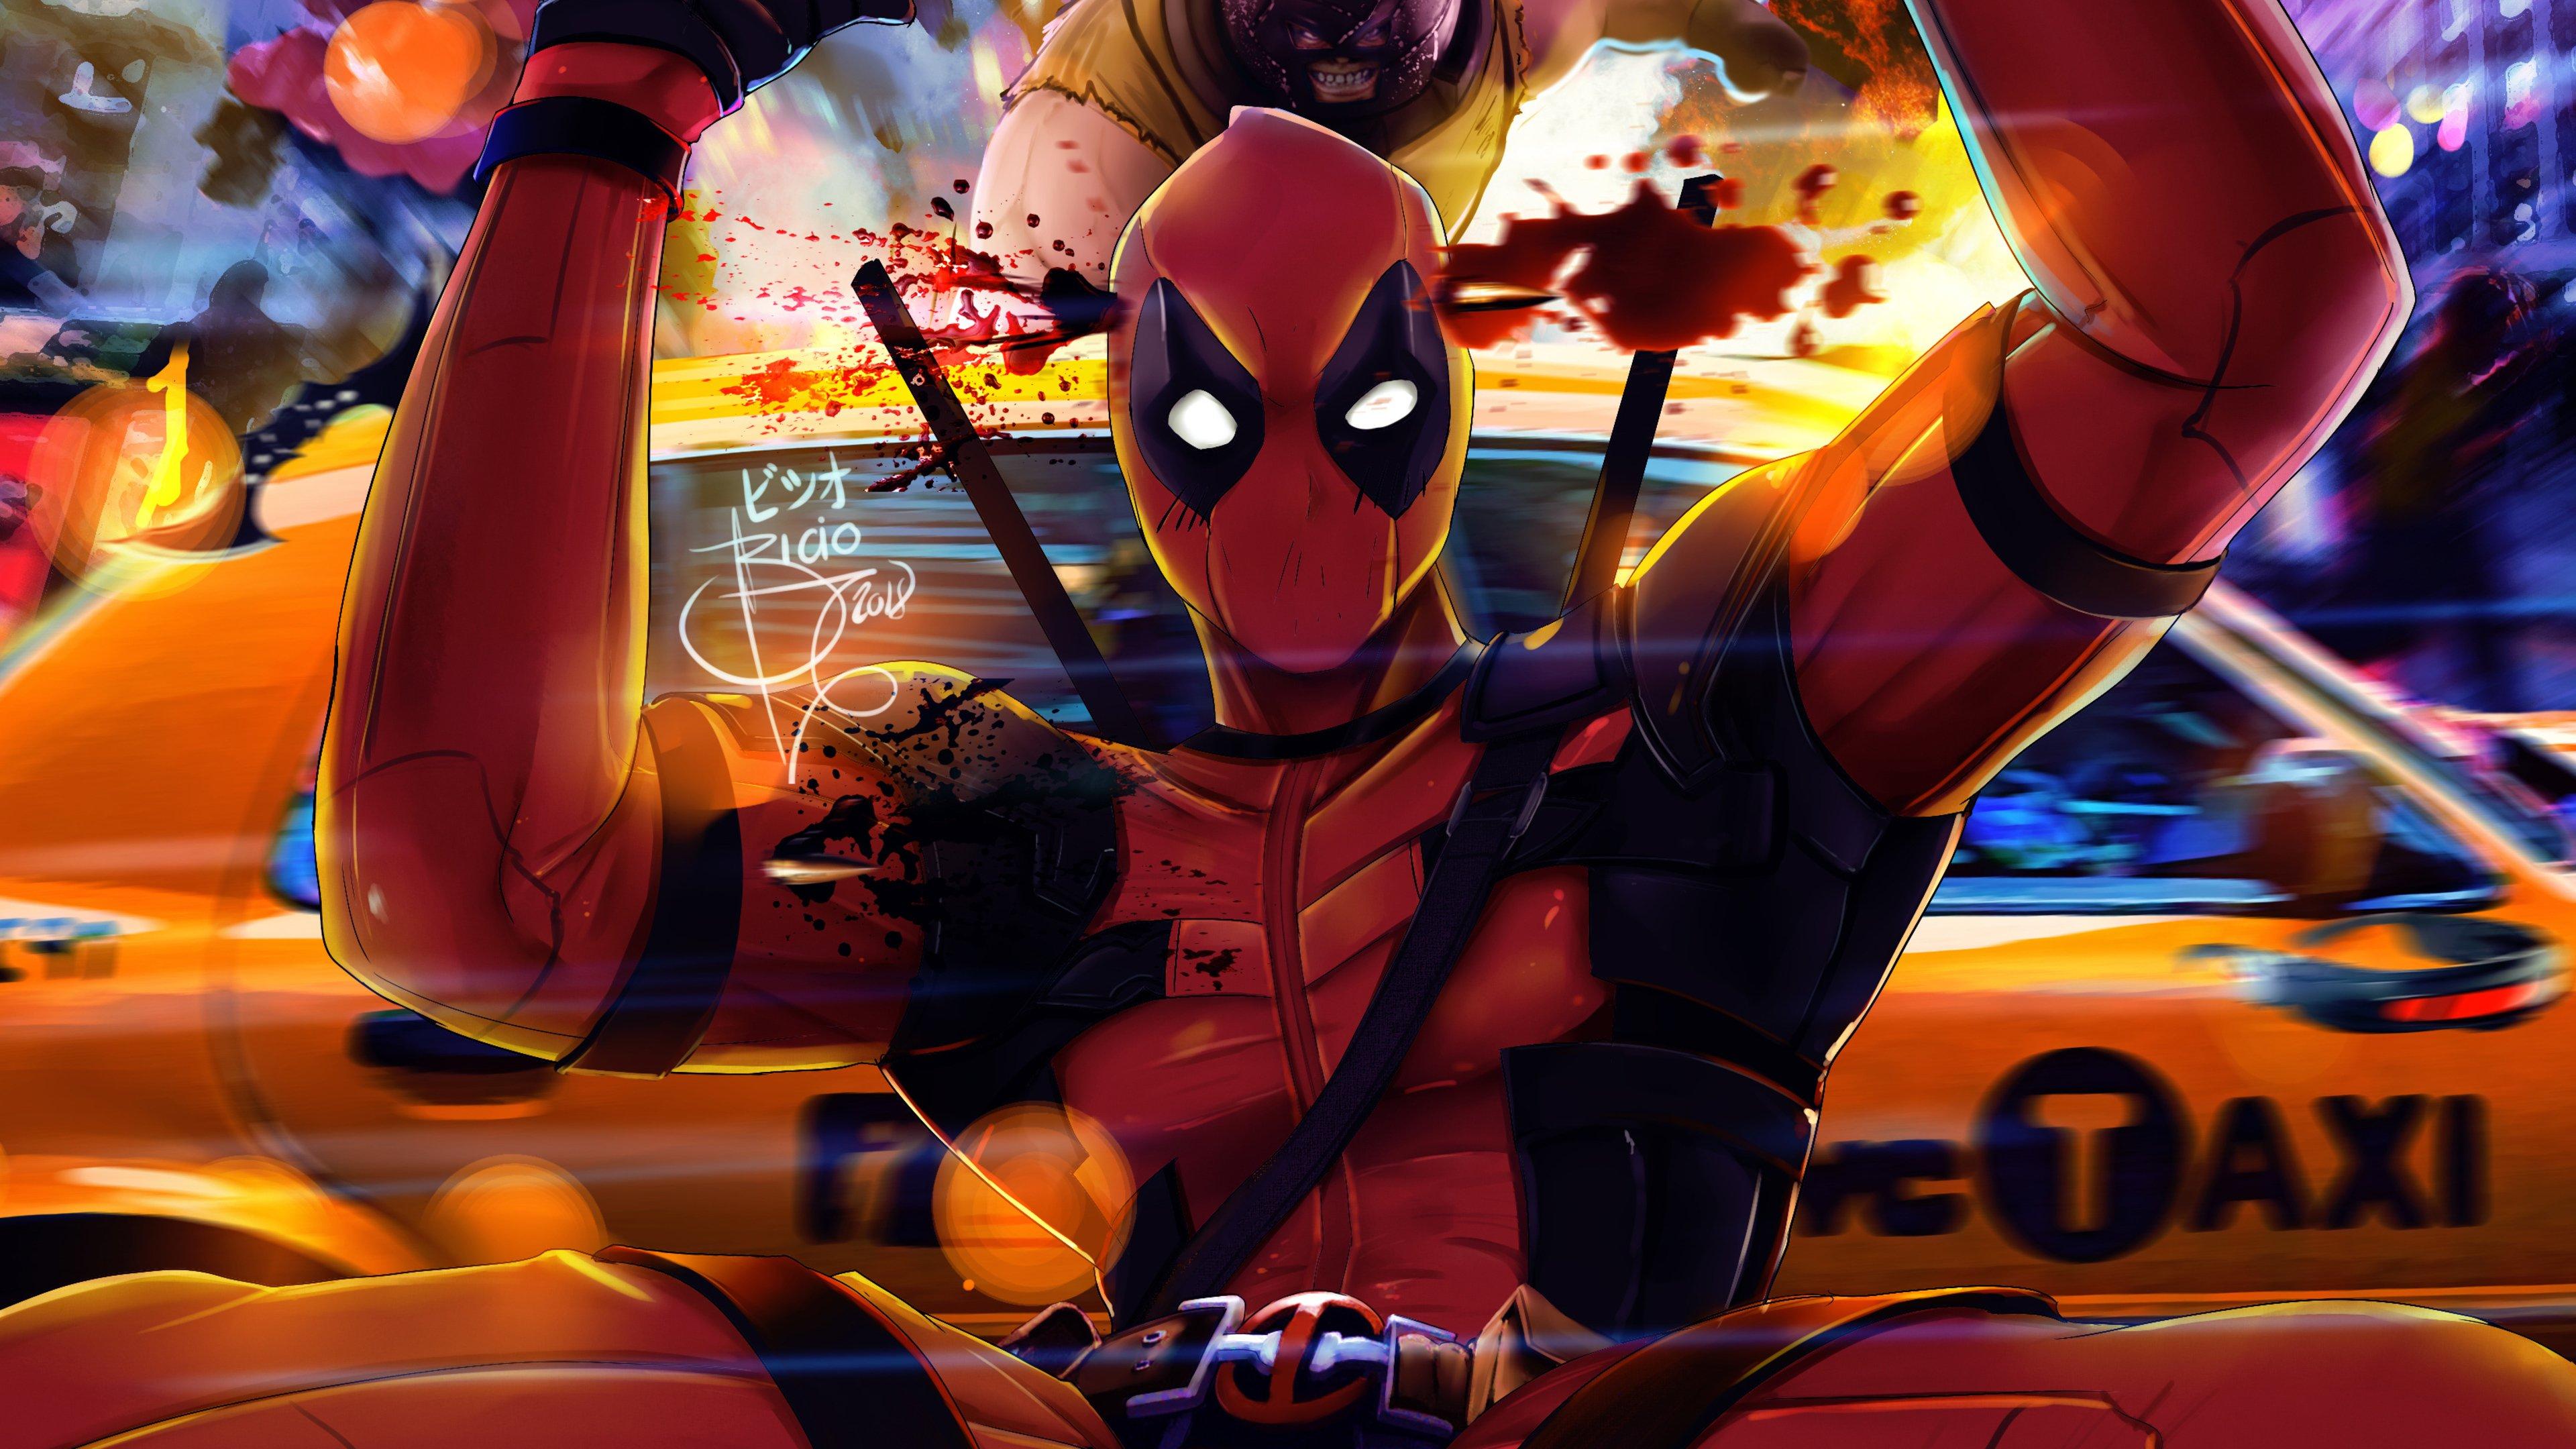 Fondos de pantalla Deadpool 2 Artwork